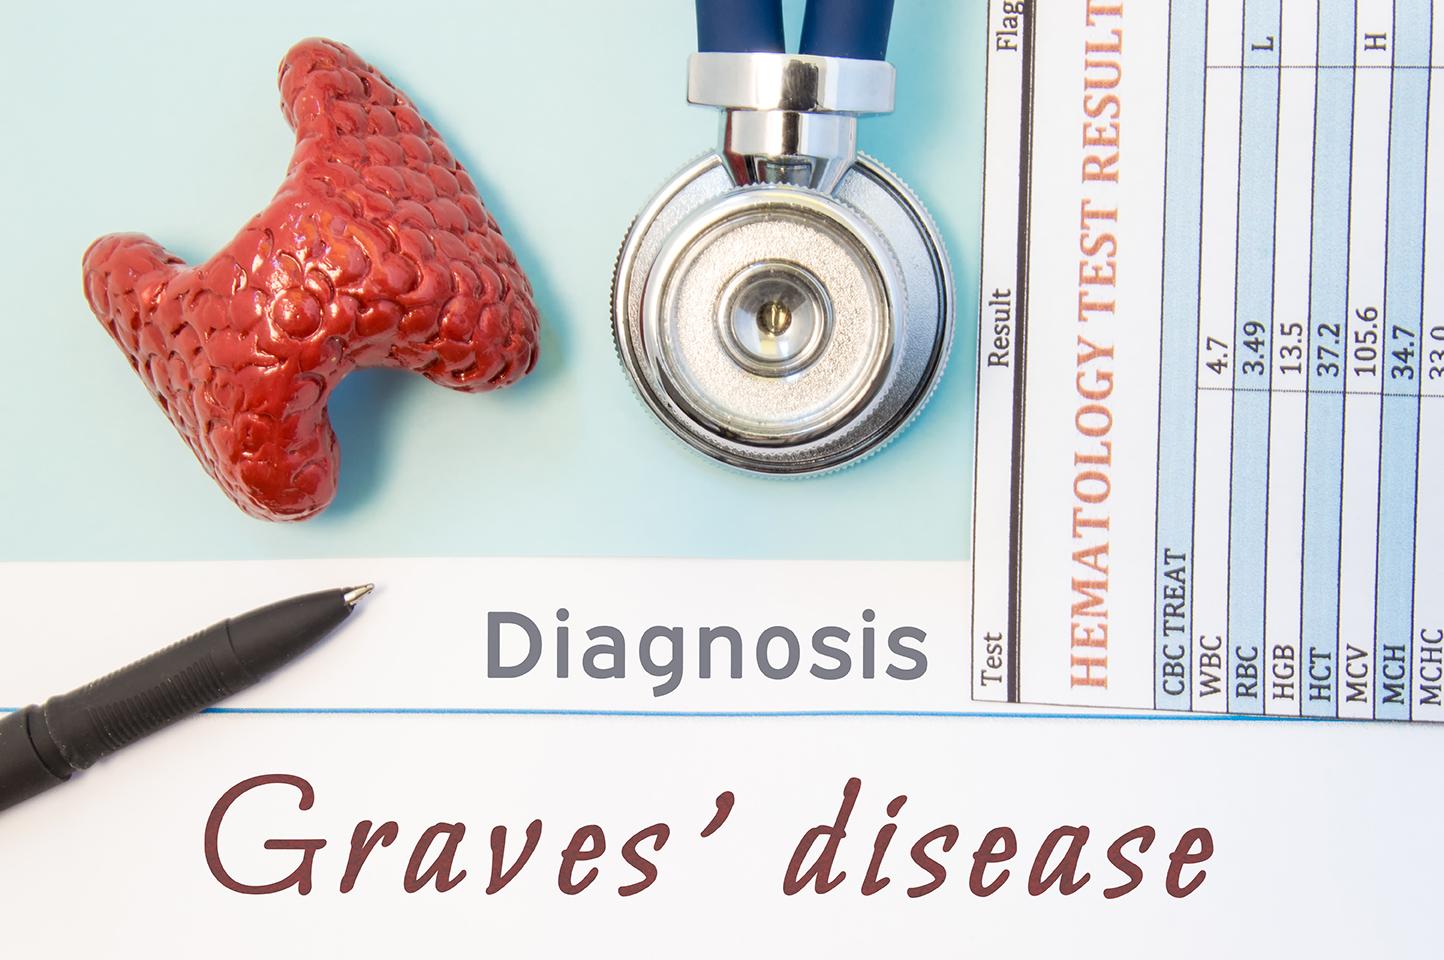 Graves' disease diagnosis